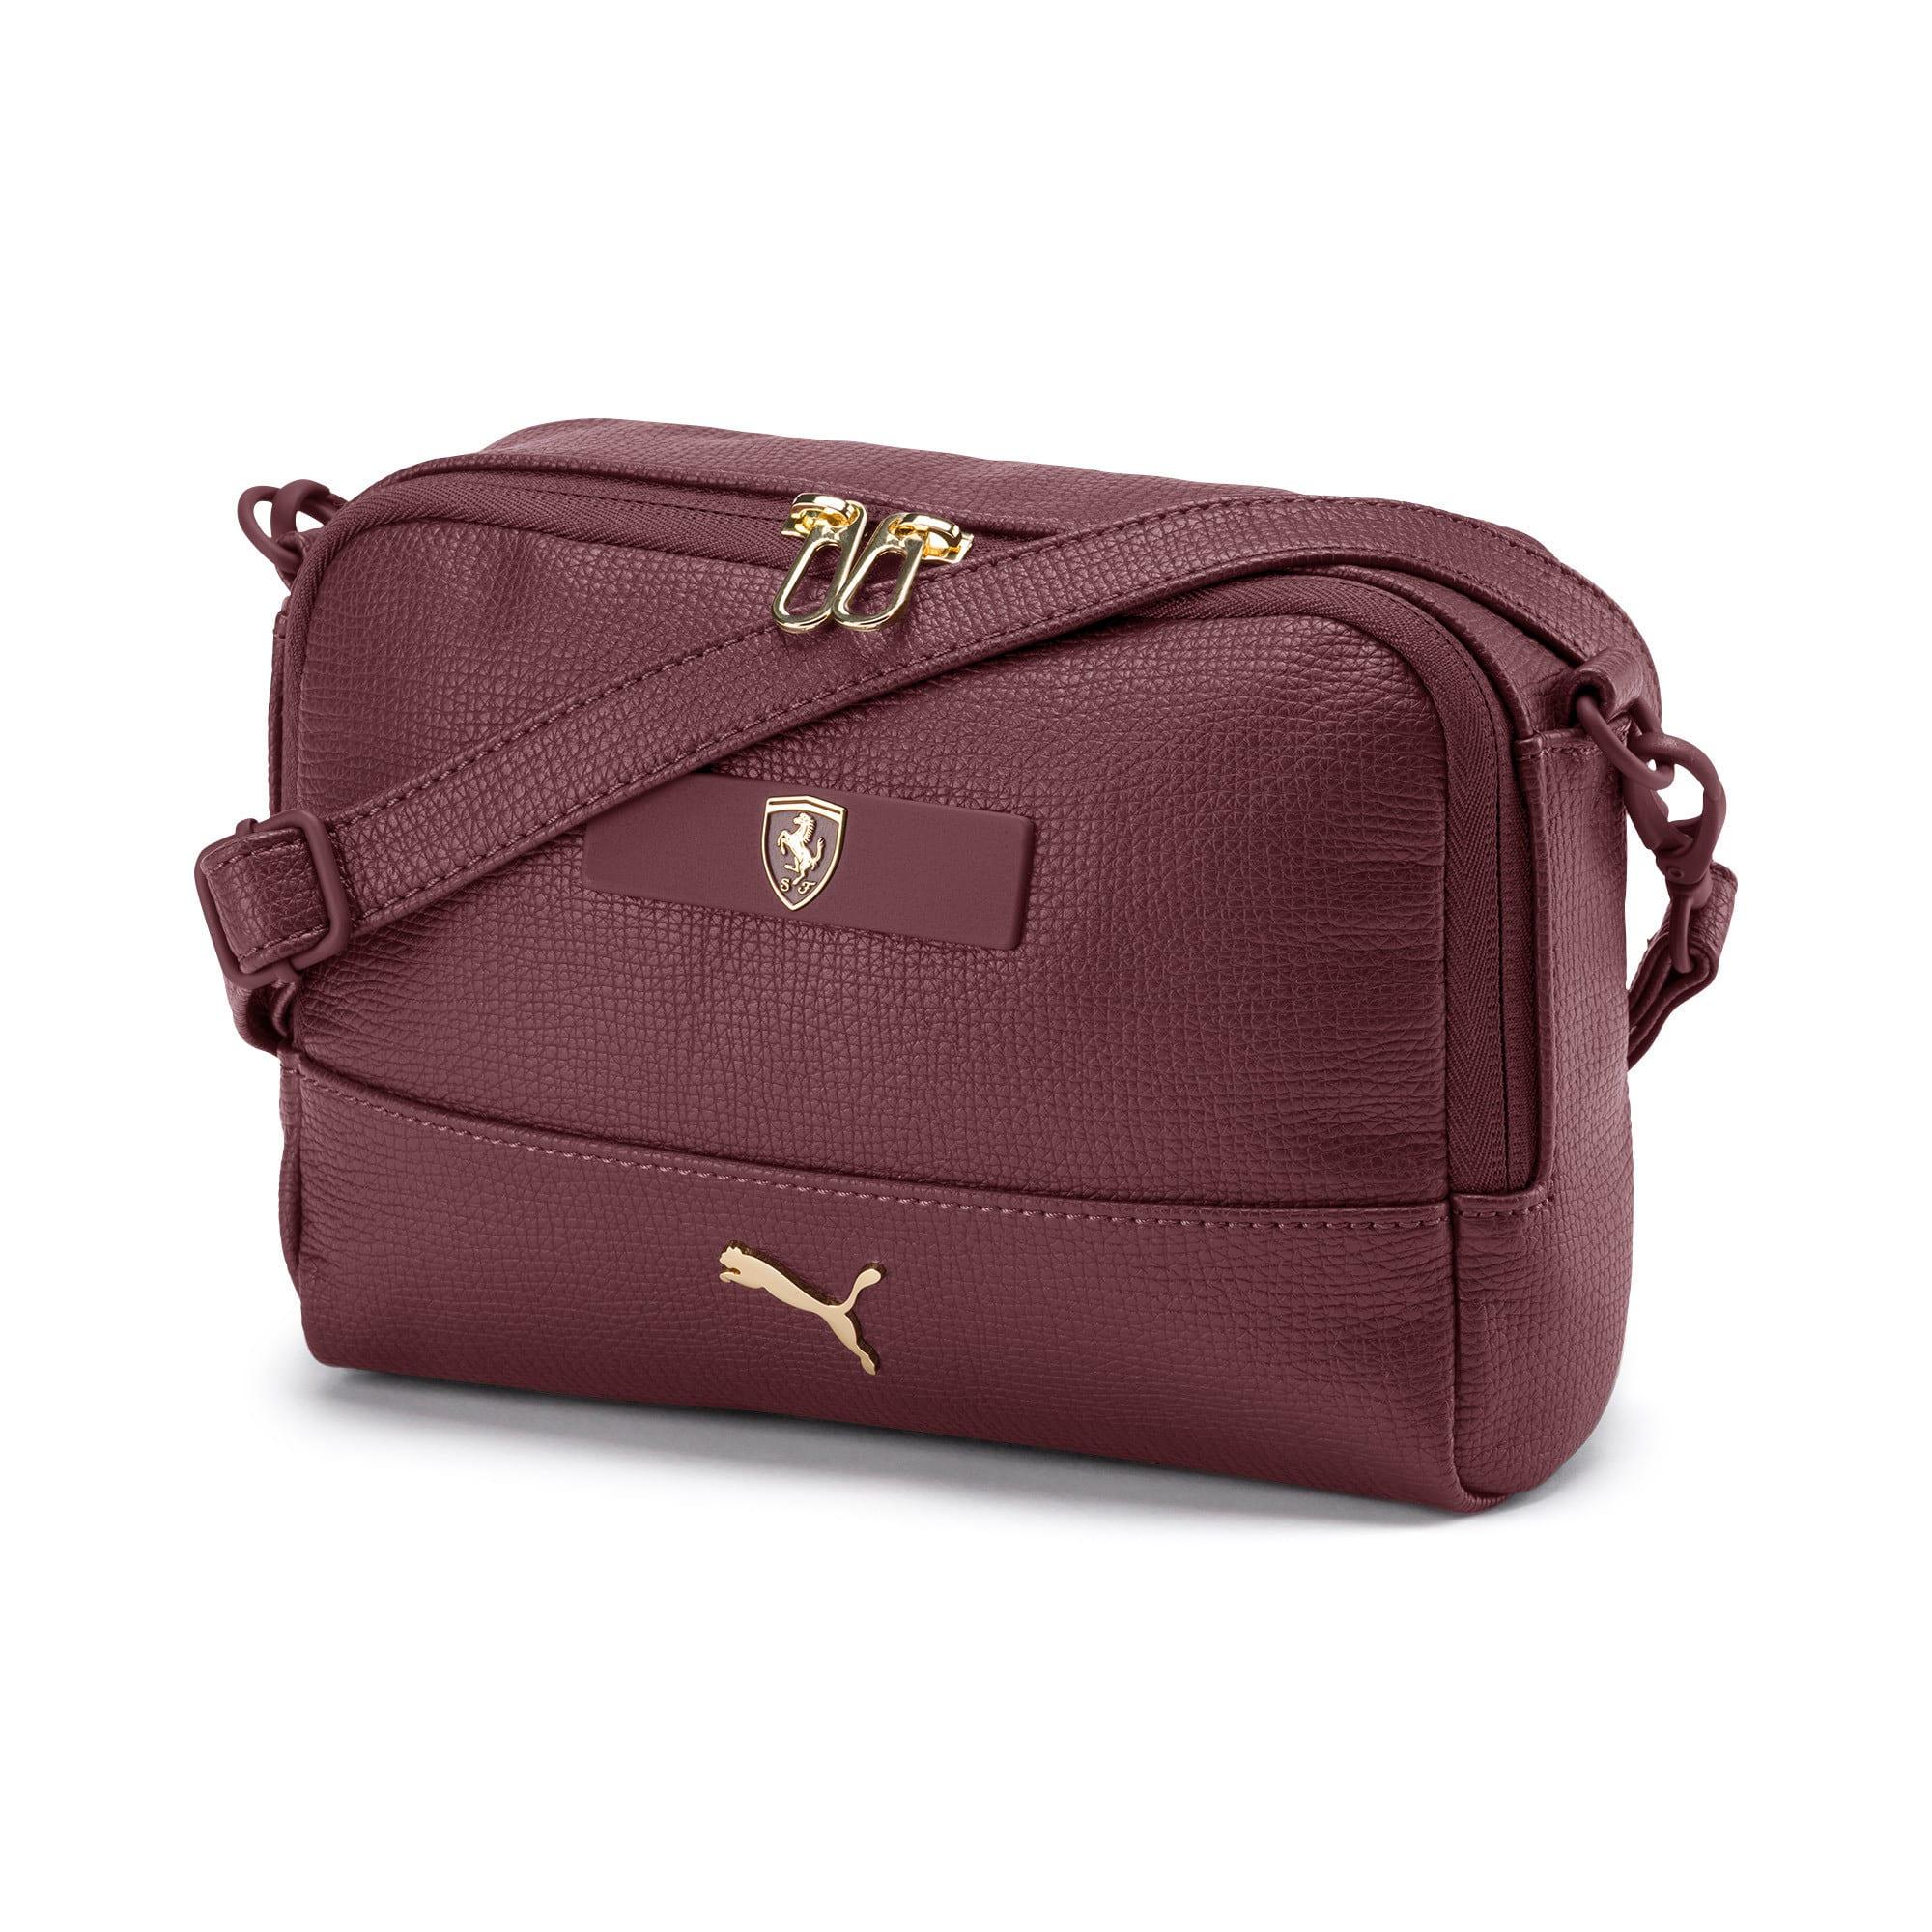 Thumbnail 1 of PUMA x Ferrari Mini Women's handbag, Vineyard Wine, medium-IND